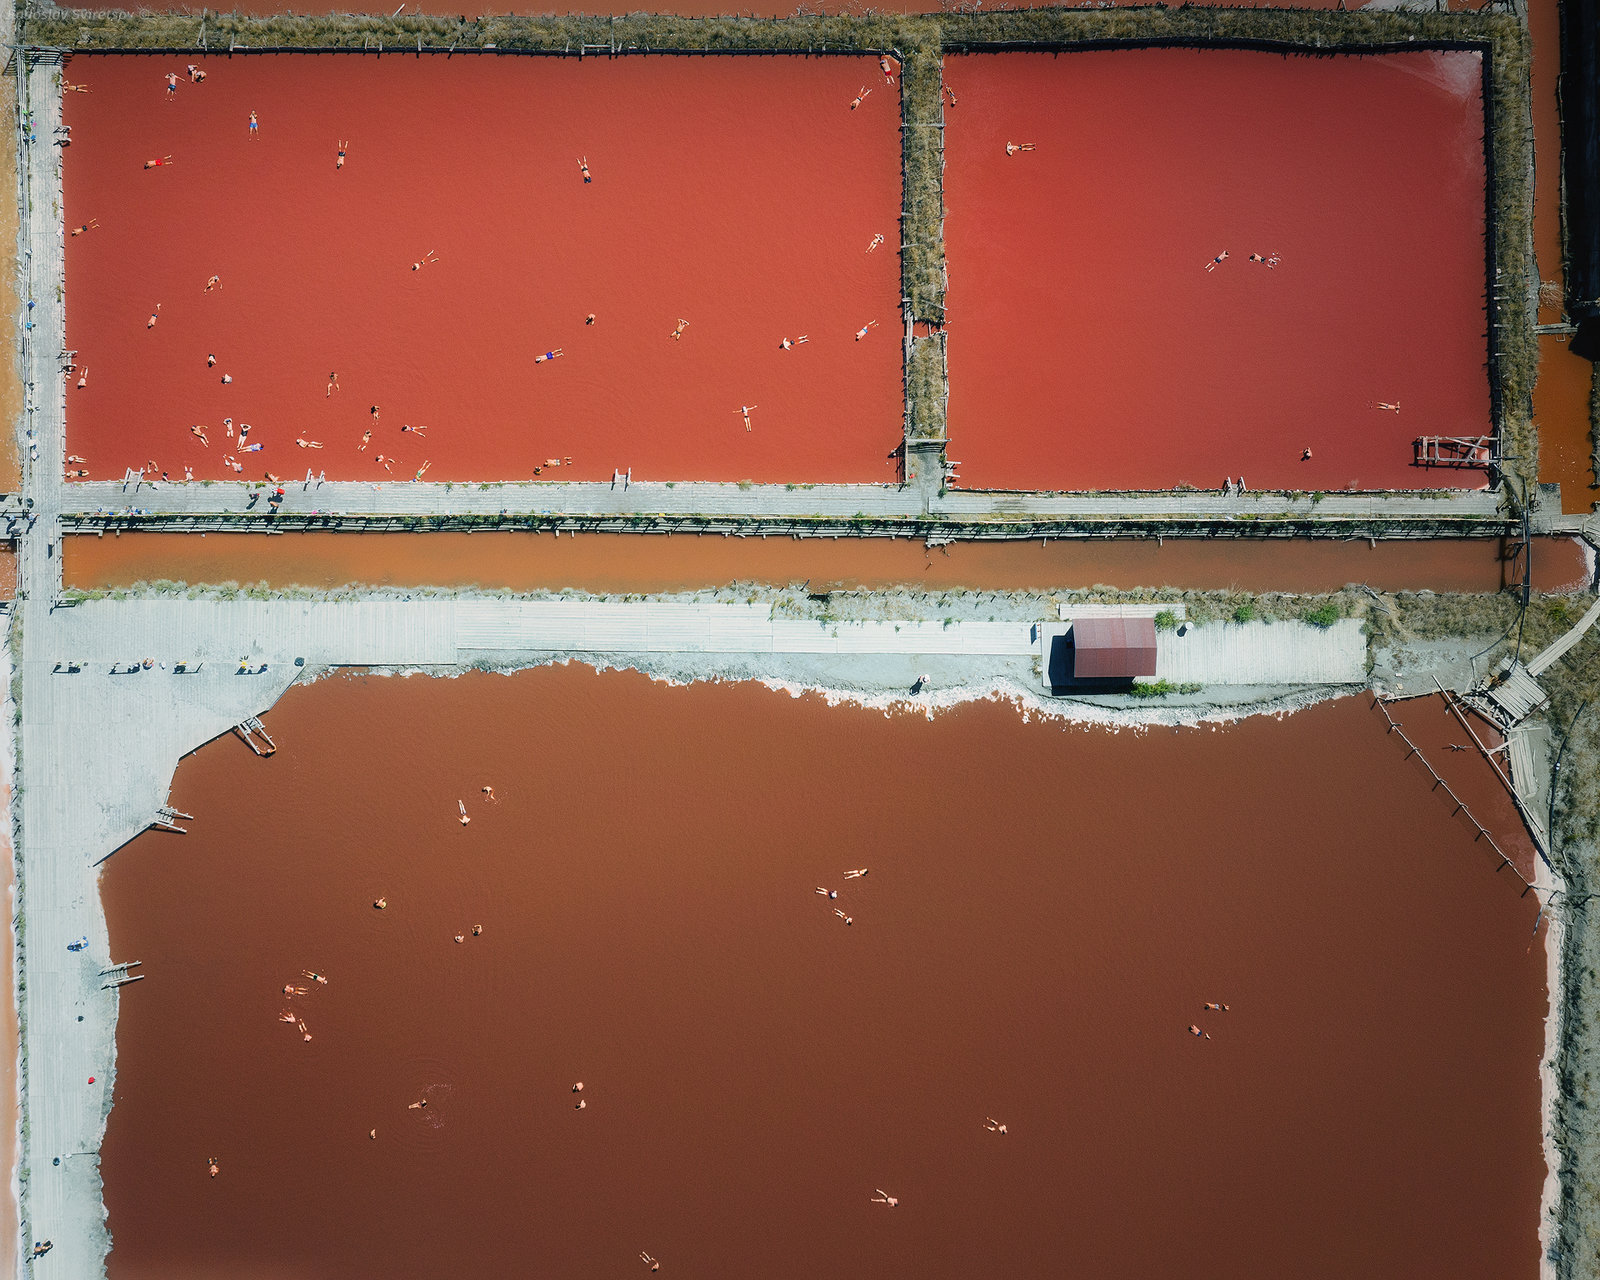 Photo in Aerial | Author Radoslav Sviretsov - rgsphot | PHOTO FORUM